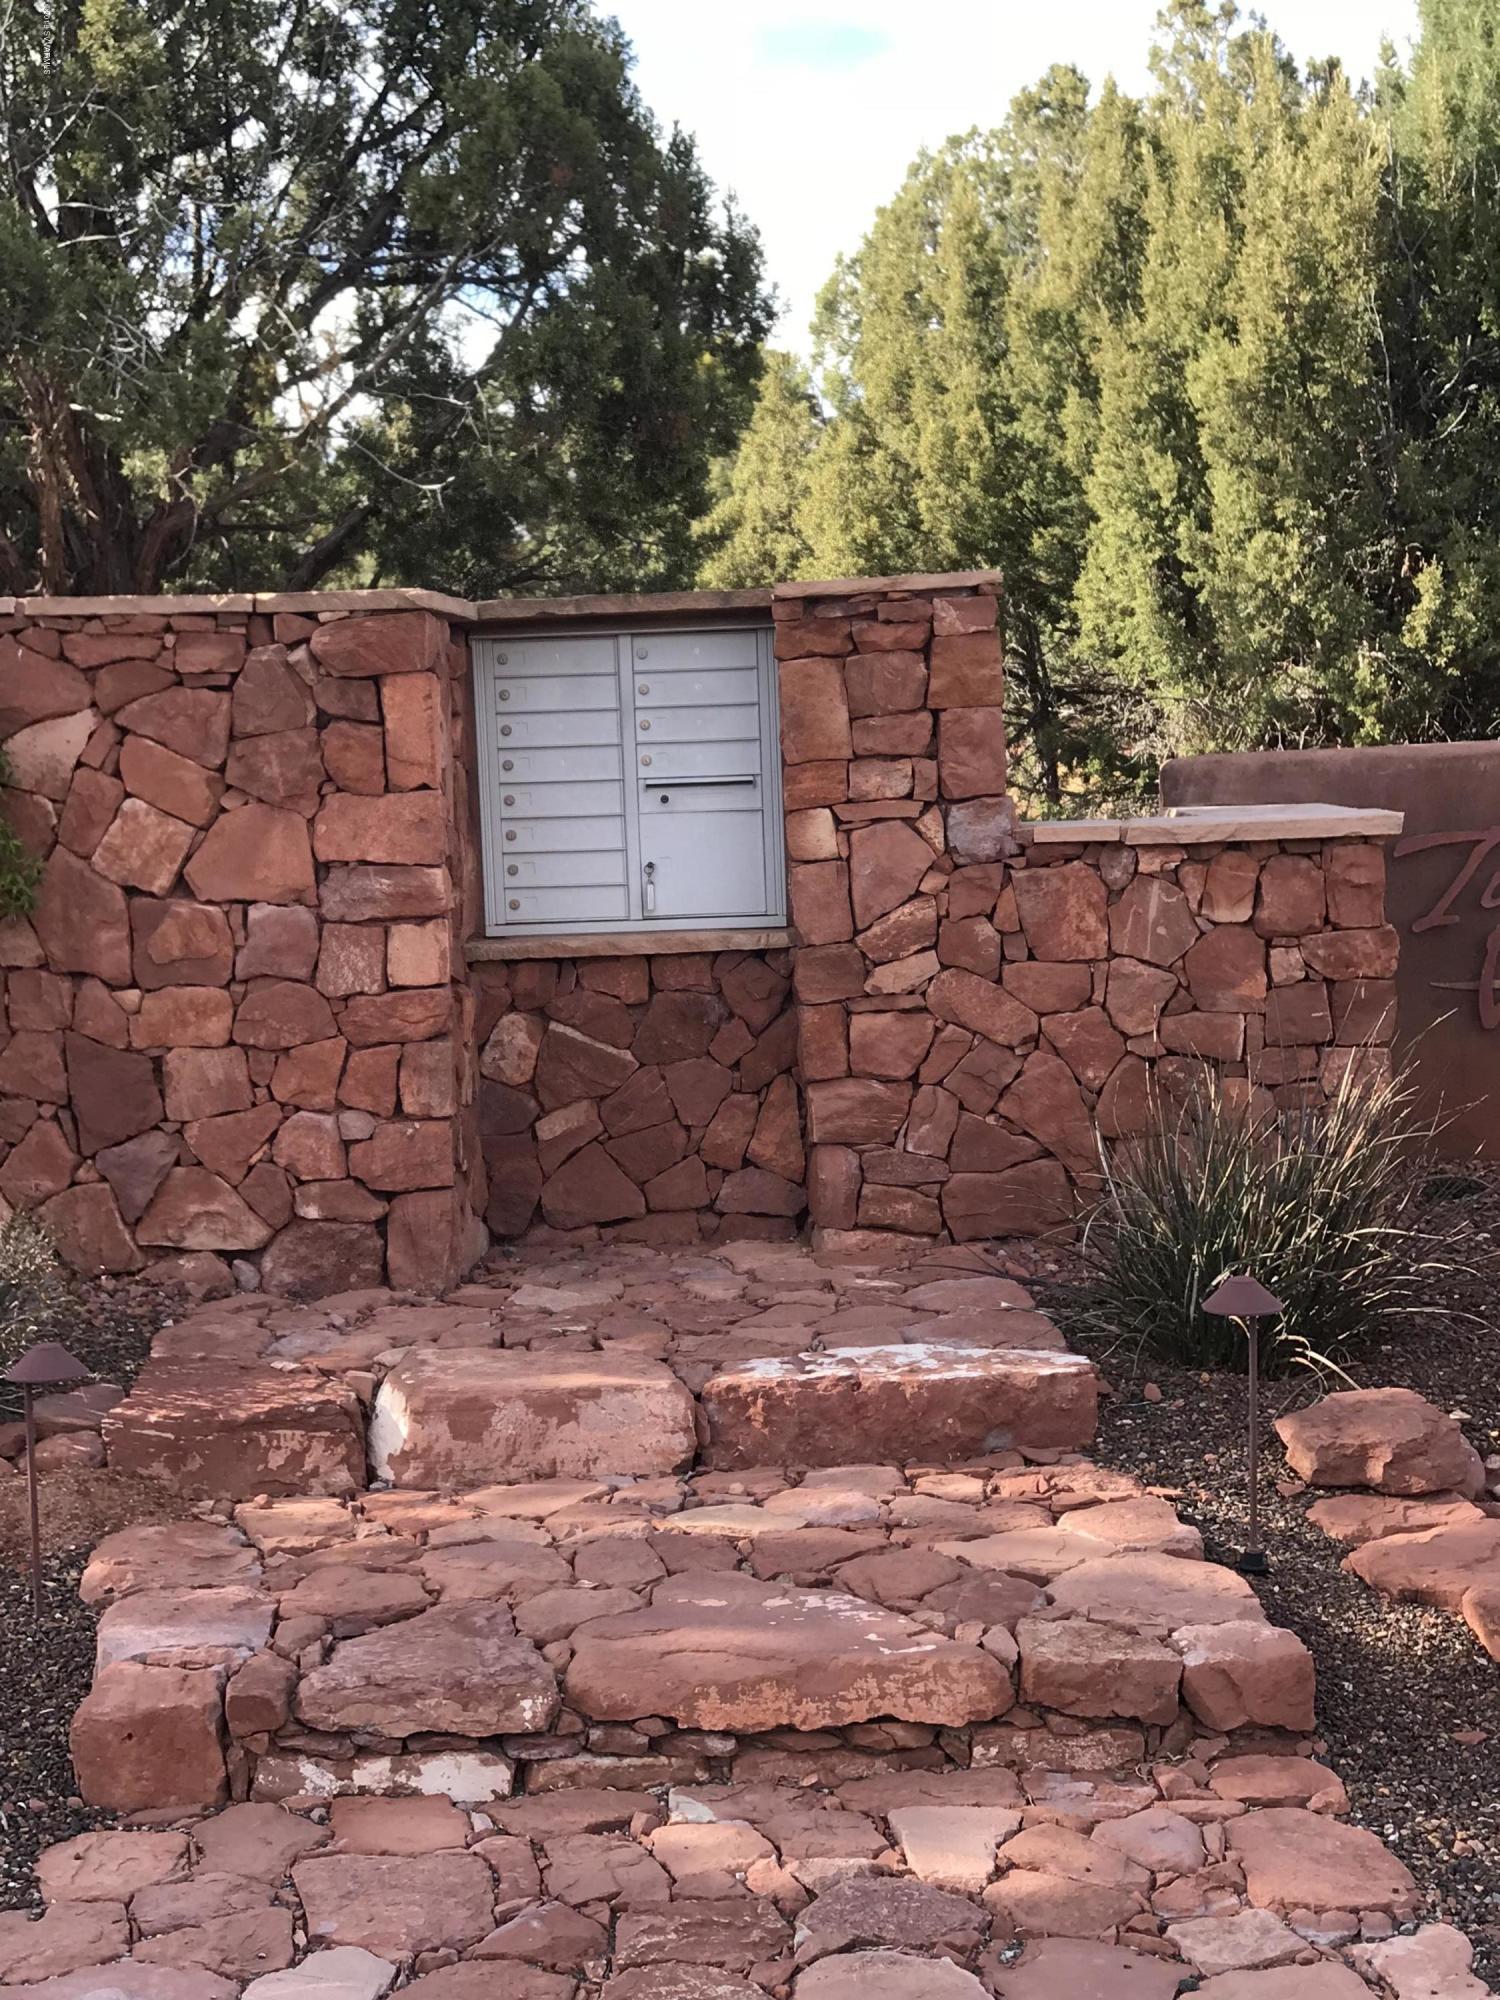 75 Vista Serrena Sedona, AZ 86336